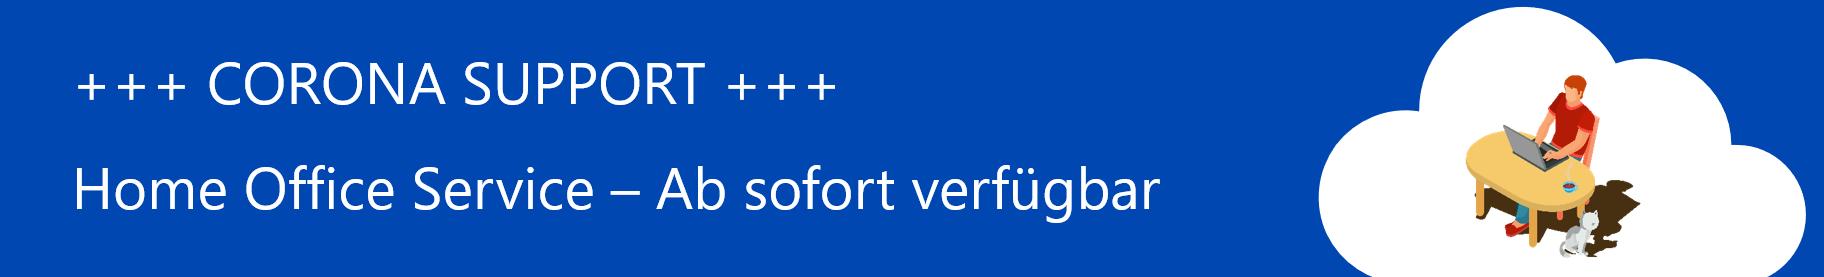 FirstAttribute - Home Office Service ab sofort verfügbar